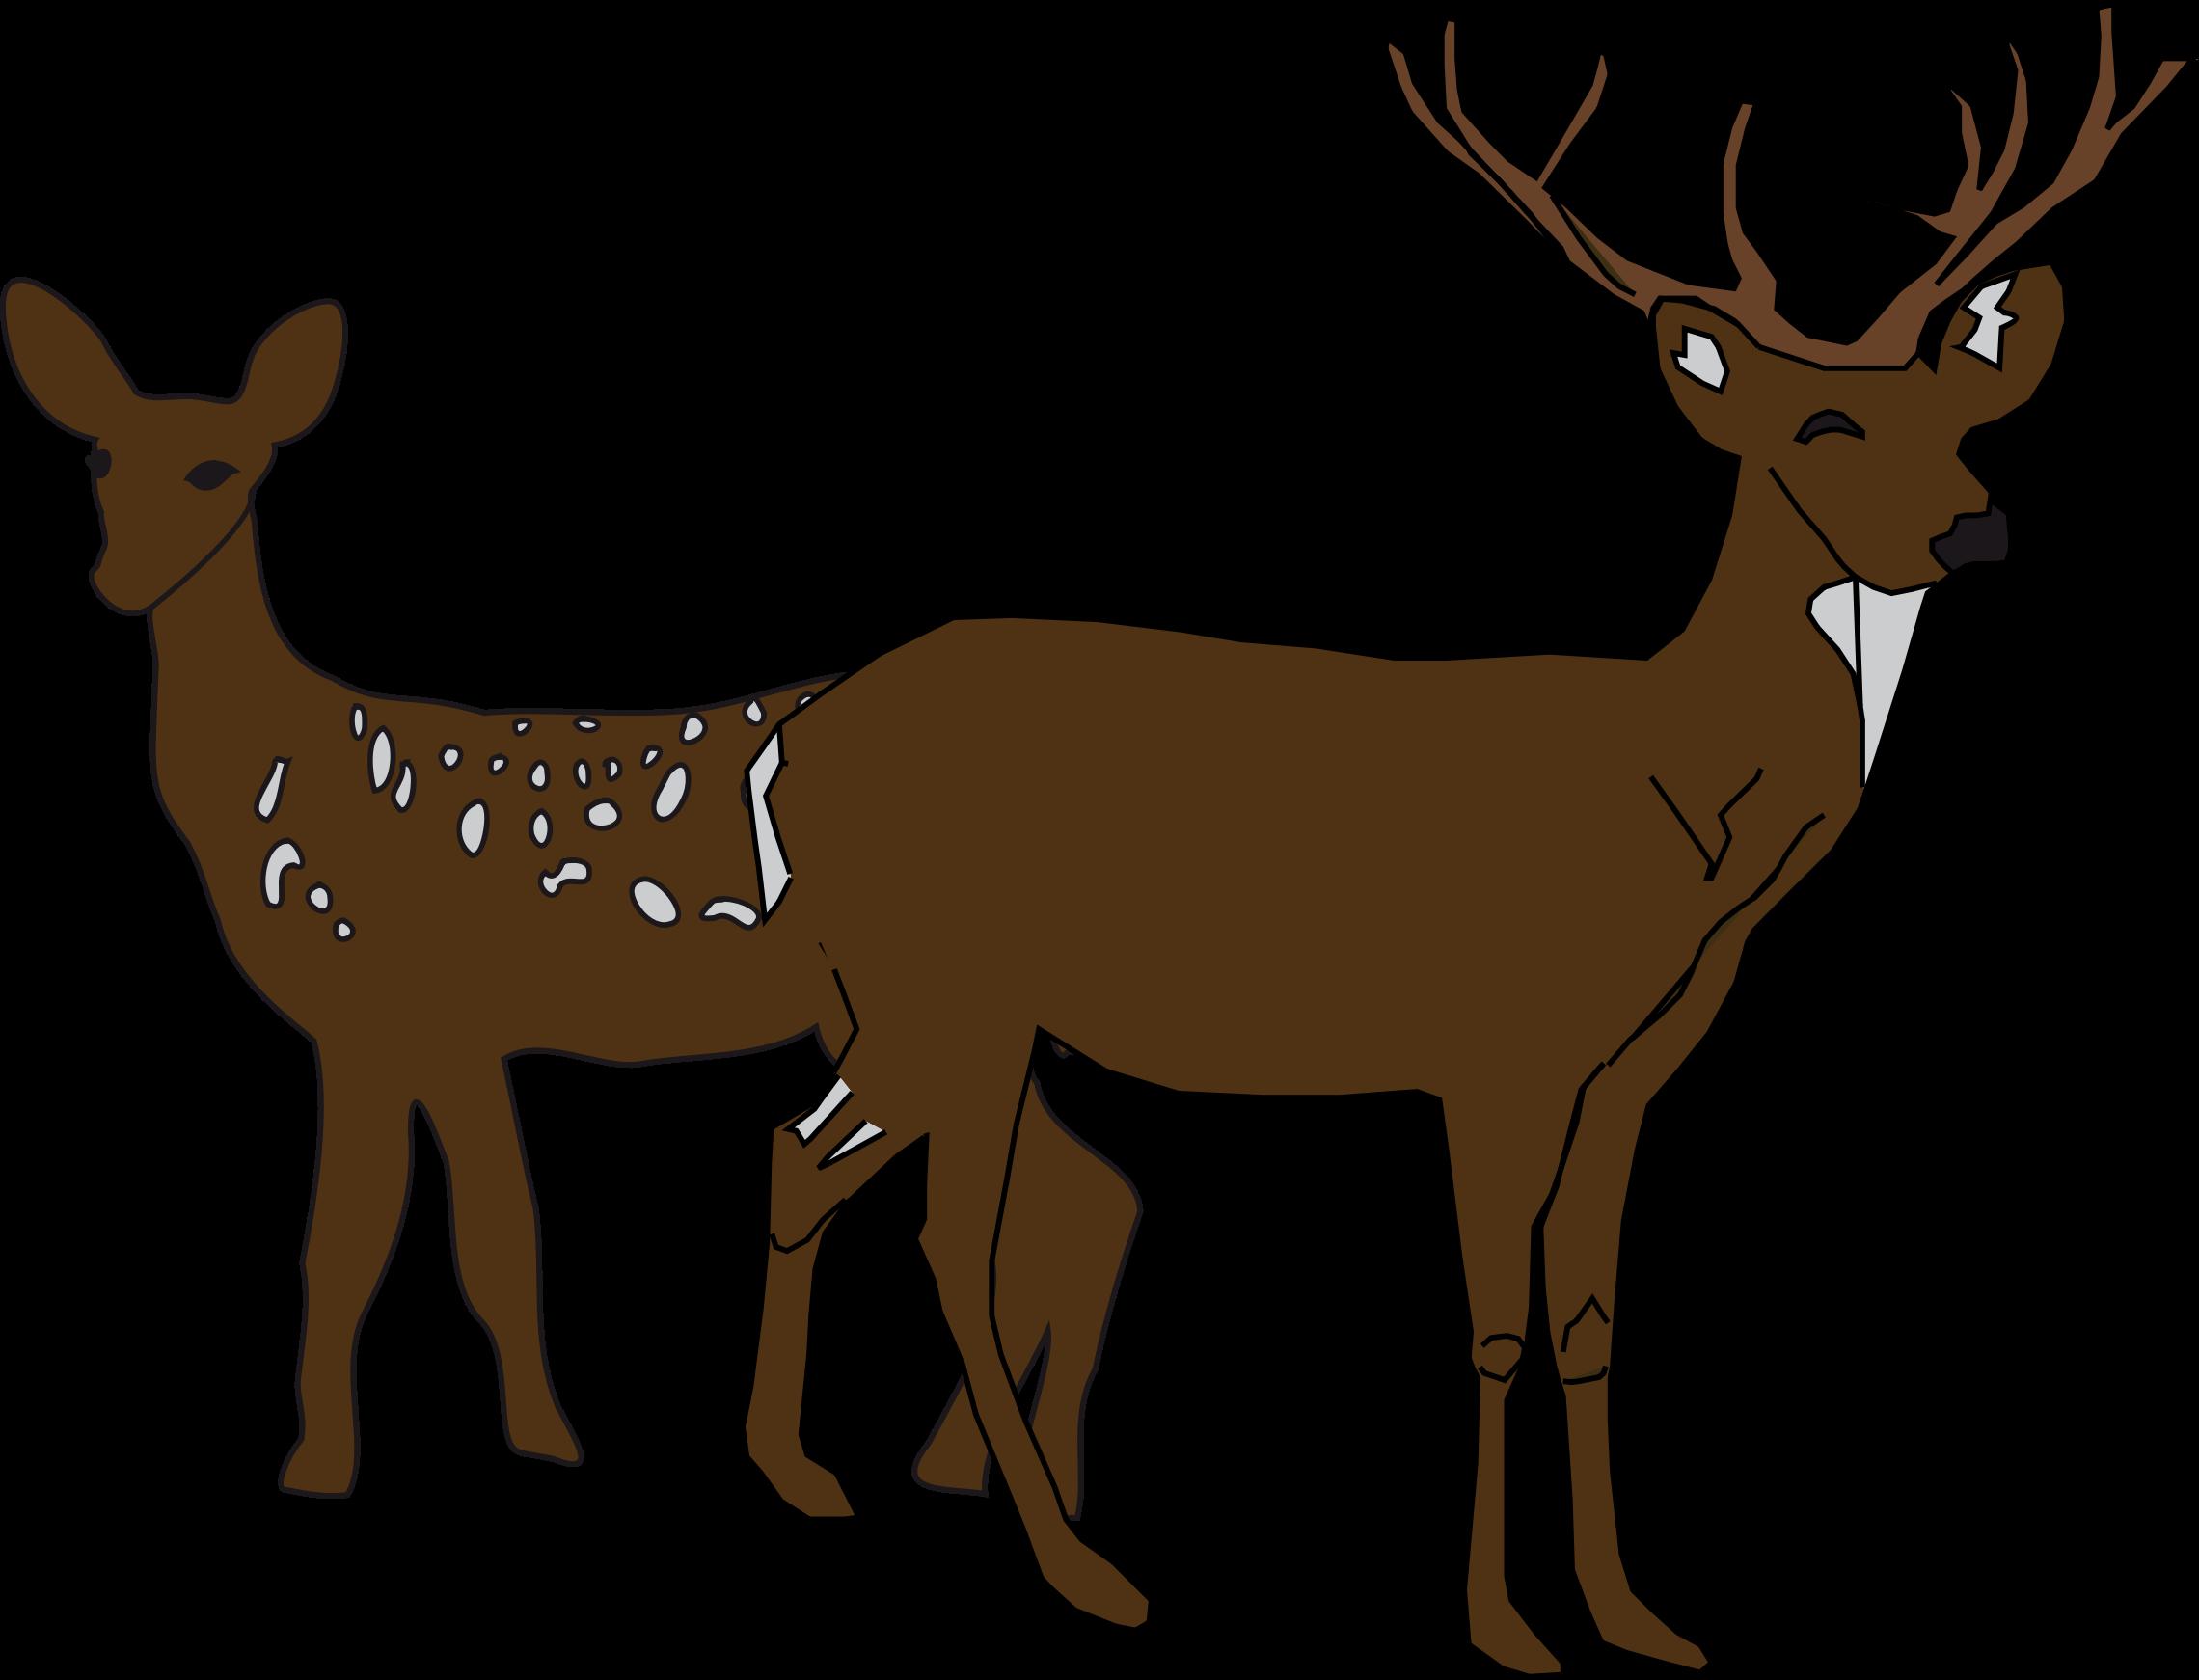 Remix big image png. Clipart mountains deer